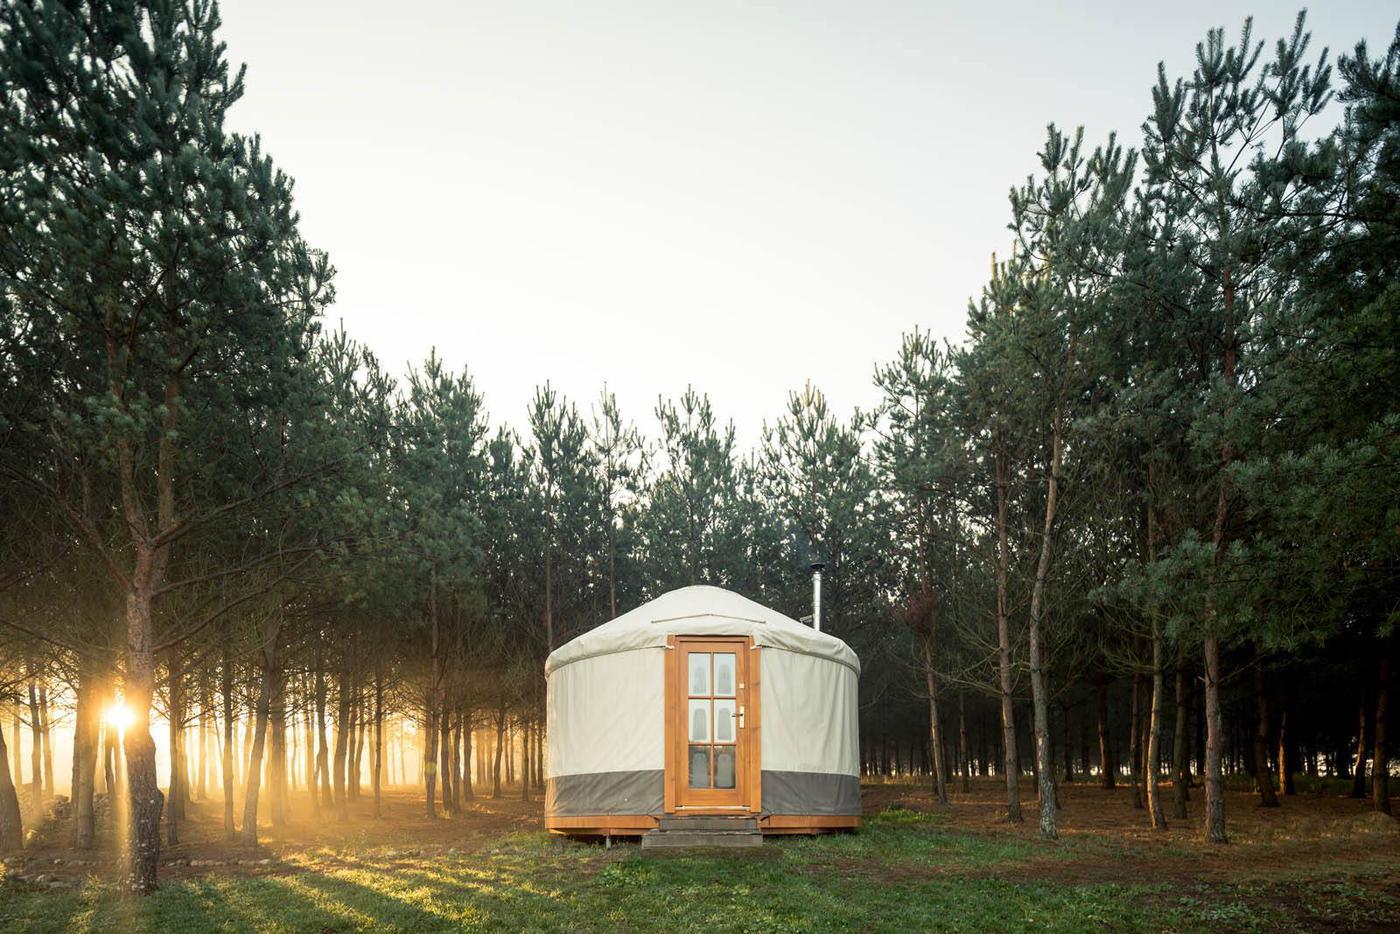 4Rest Yurts